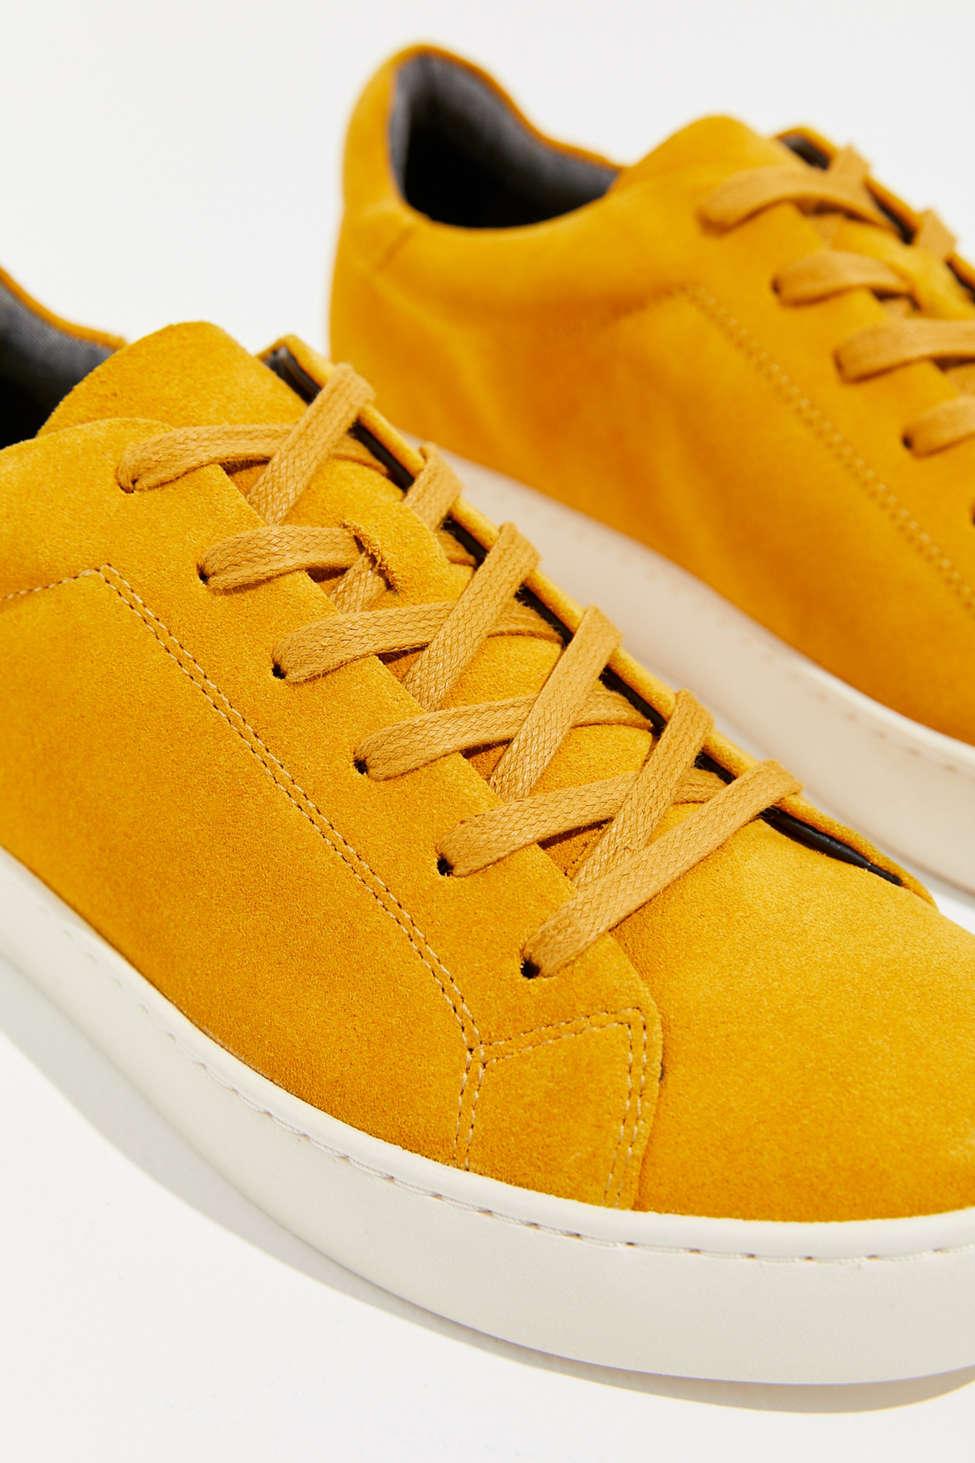 Vagabond Shoemakers Zoe Suede Sneaker by Vagabond Shoemakers